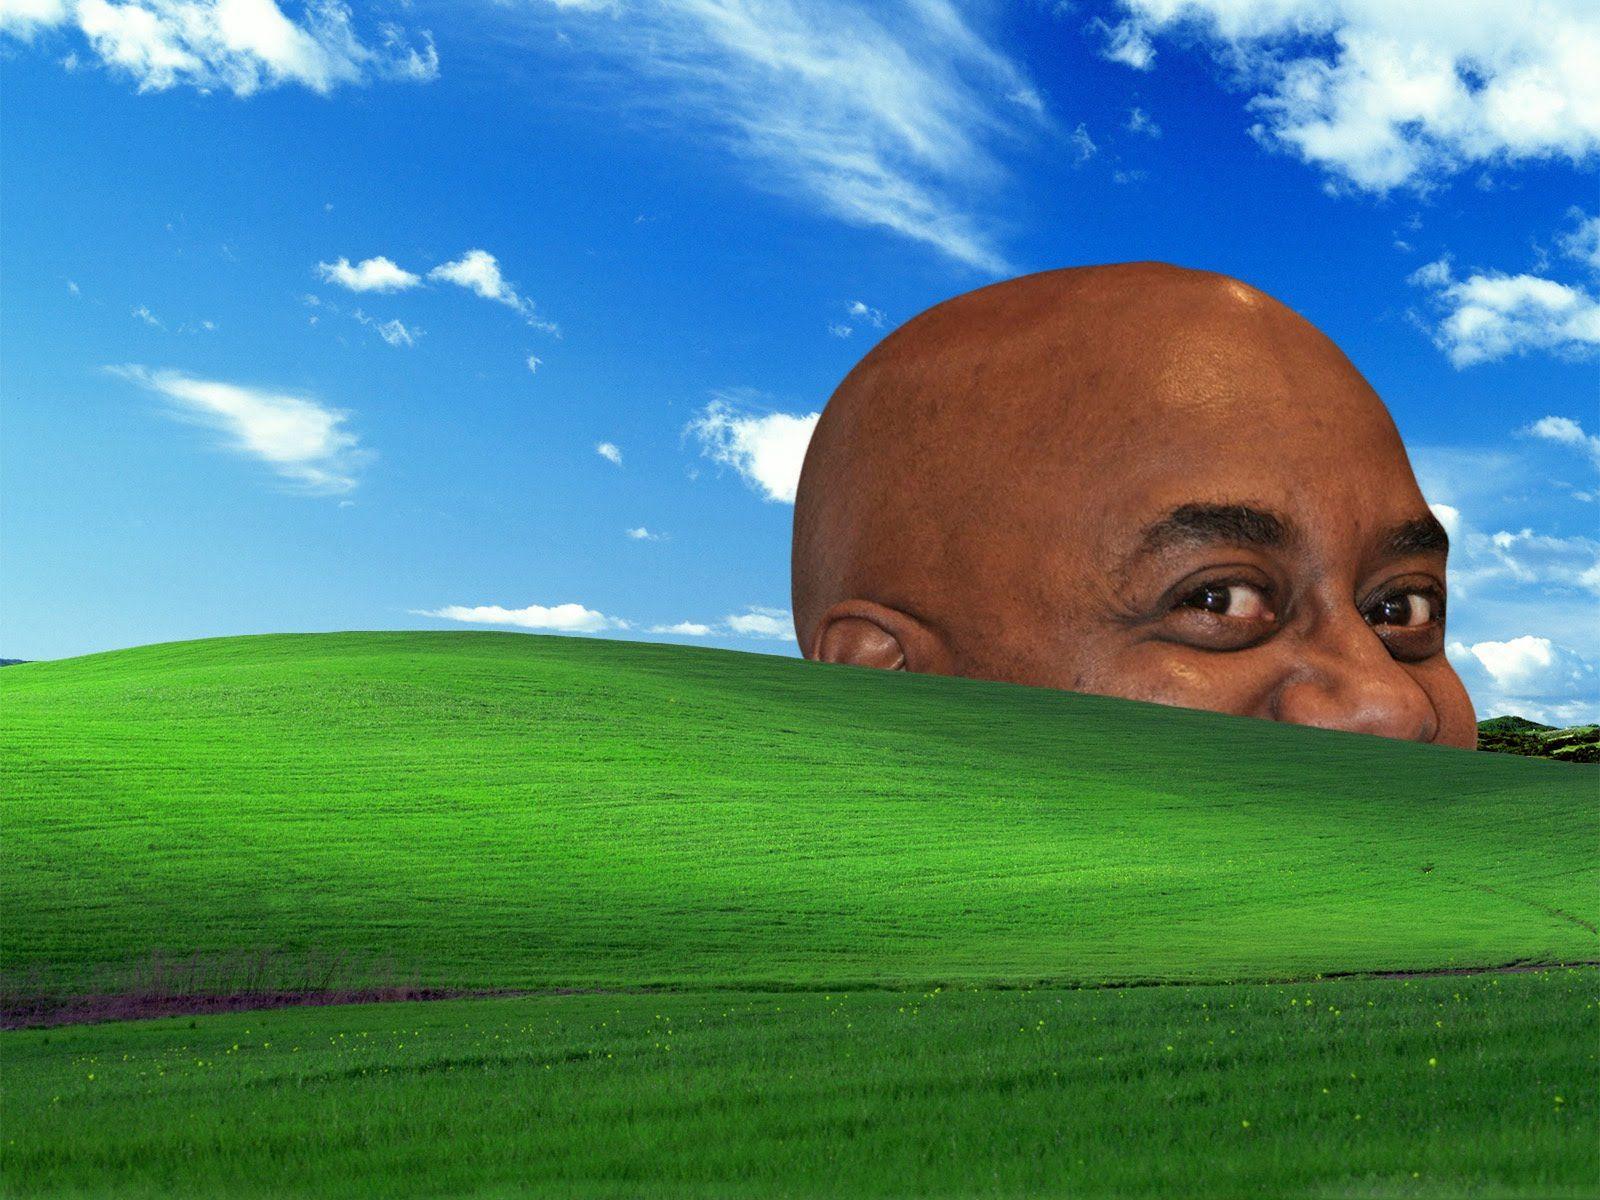 Dank Meme Wallpapers   Top Dank Meme Backgrounds 1600x1200